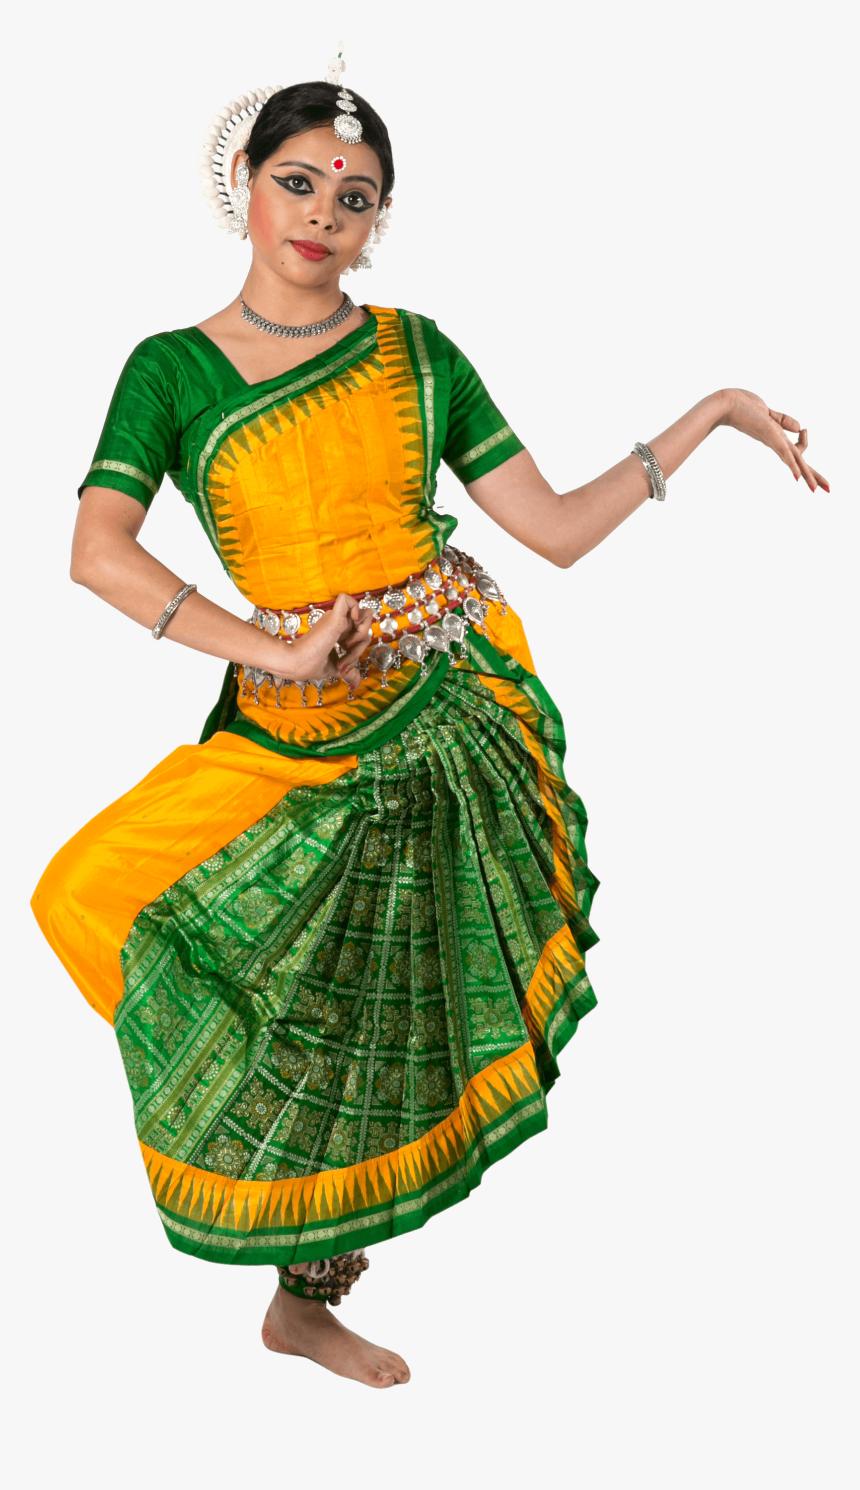 Indian Classical Dance Png Transparent Png Kindpng